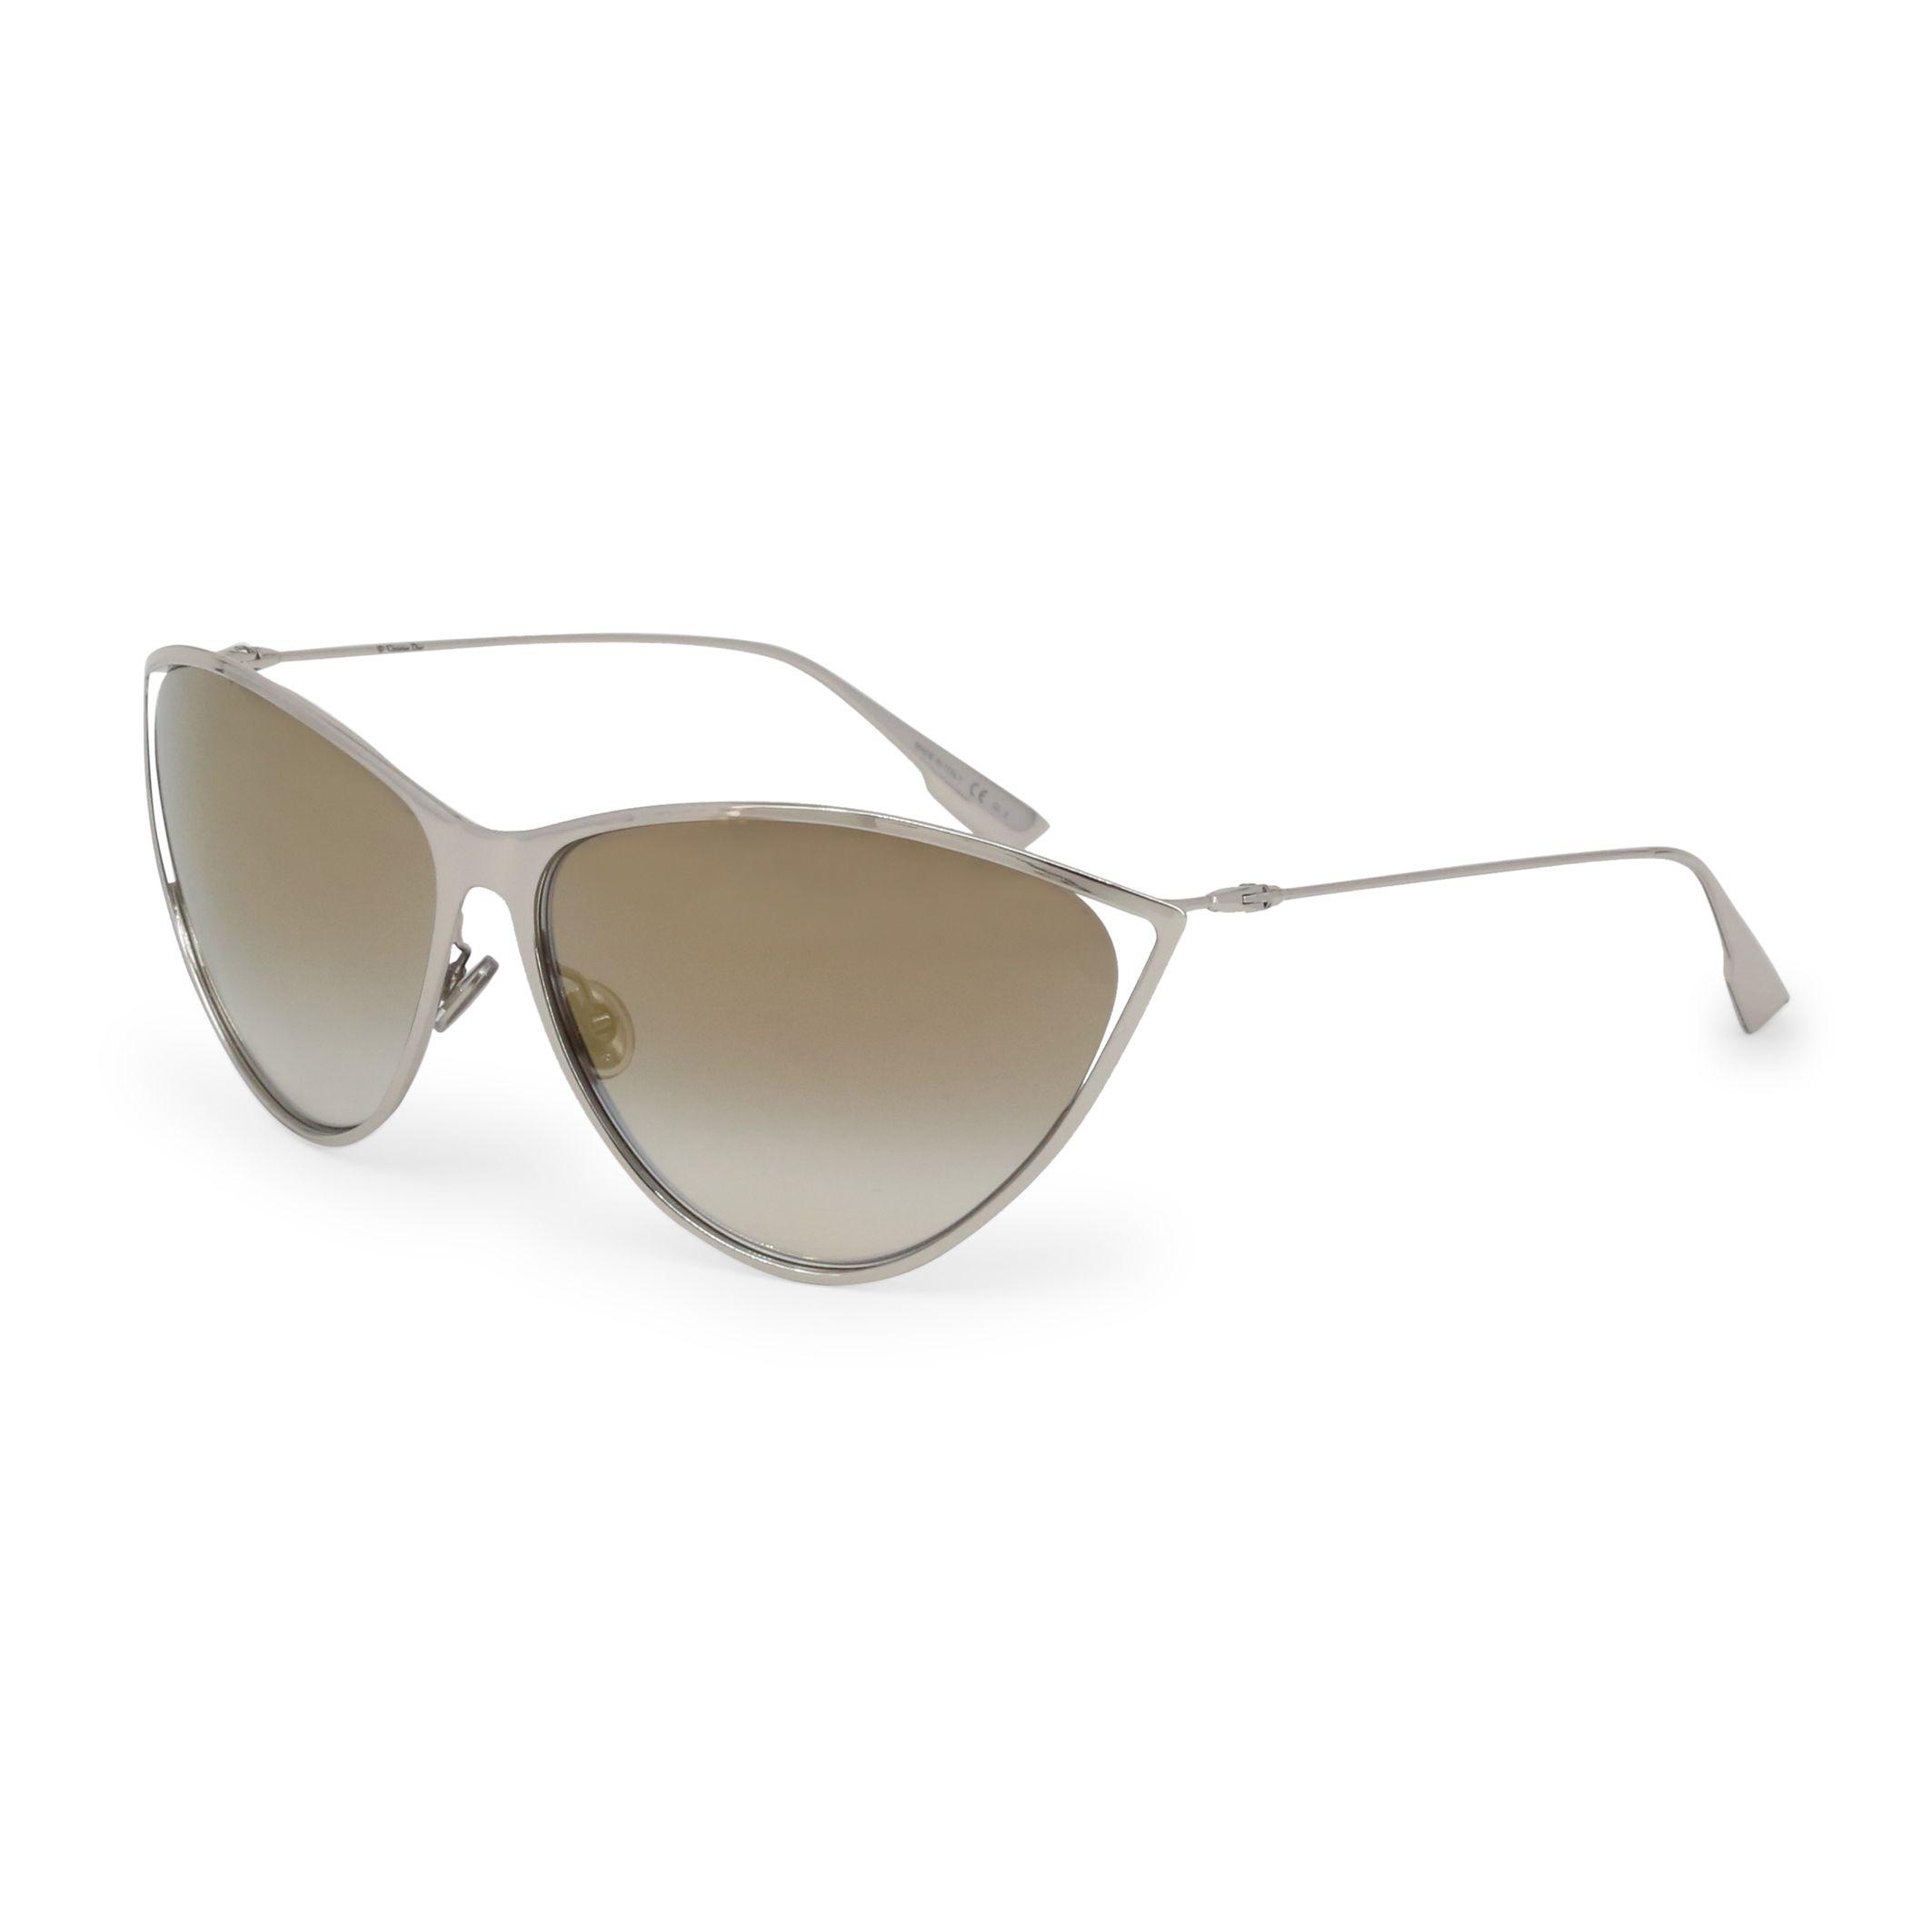 Dior Womens Sunglasses